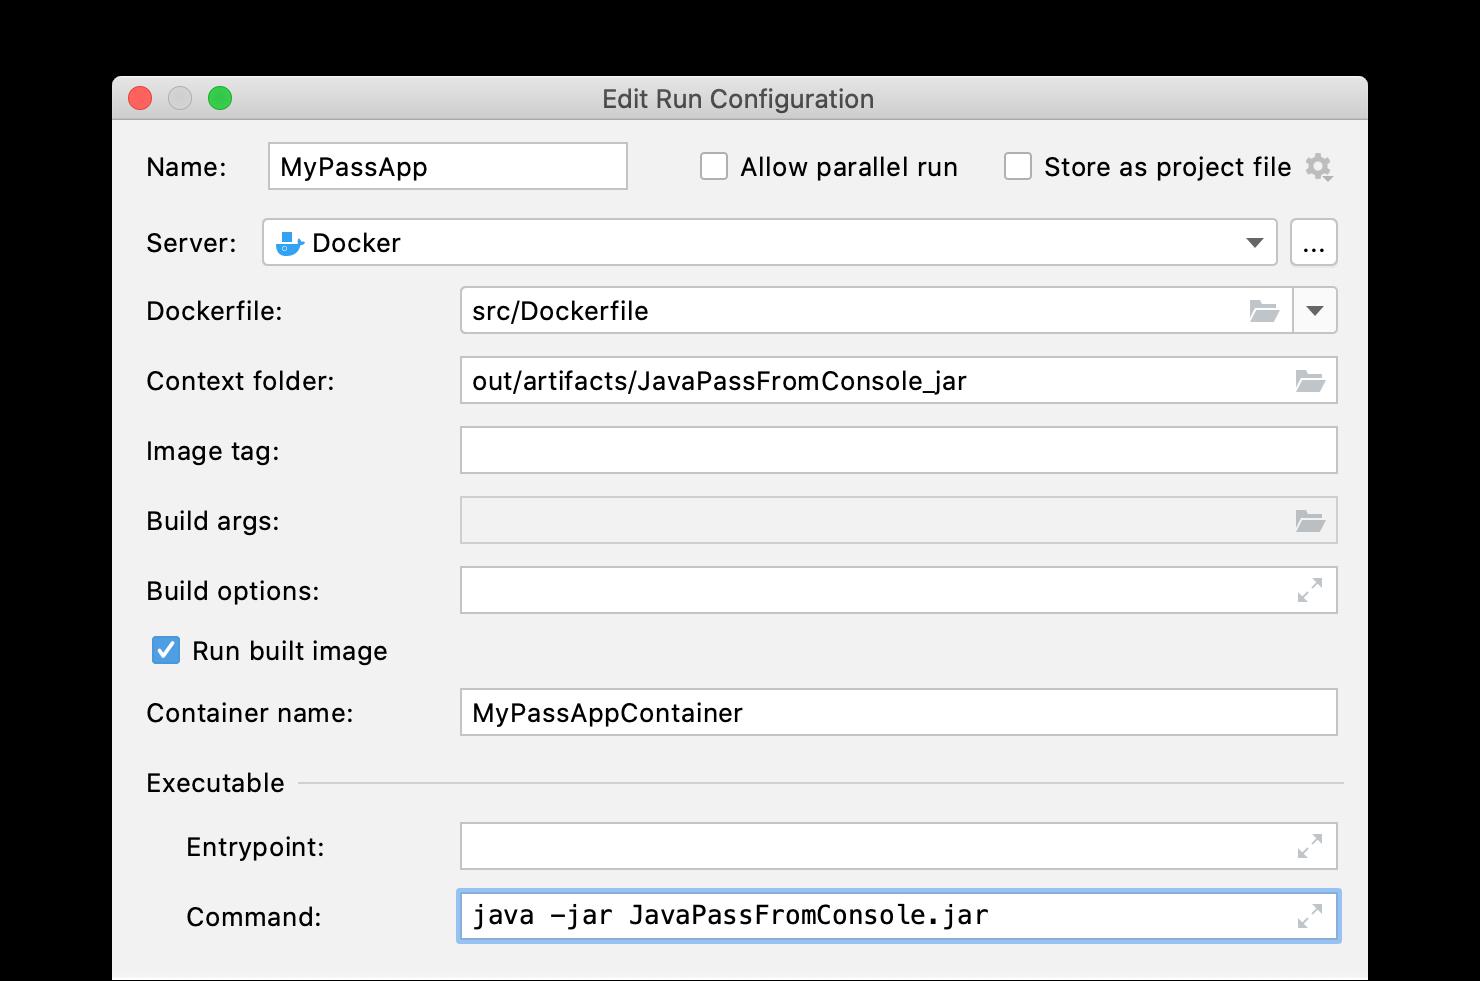 Docker run configuration from Dockerfile